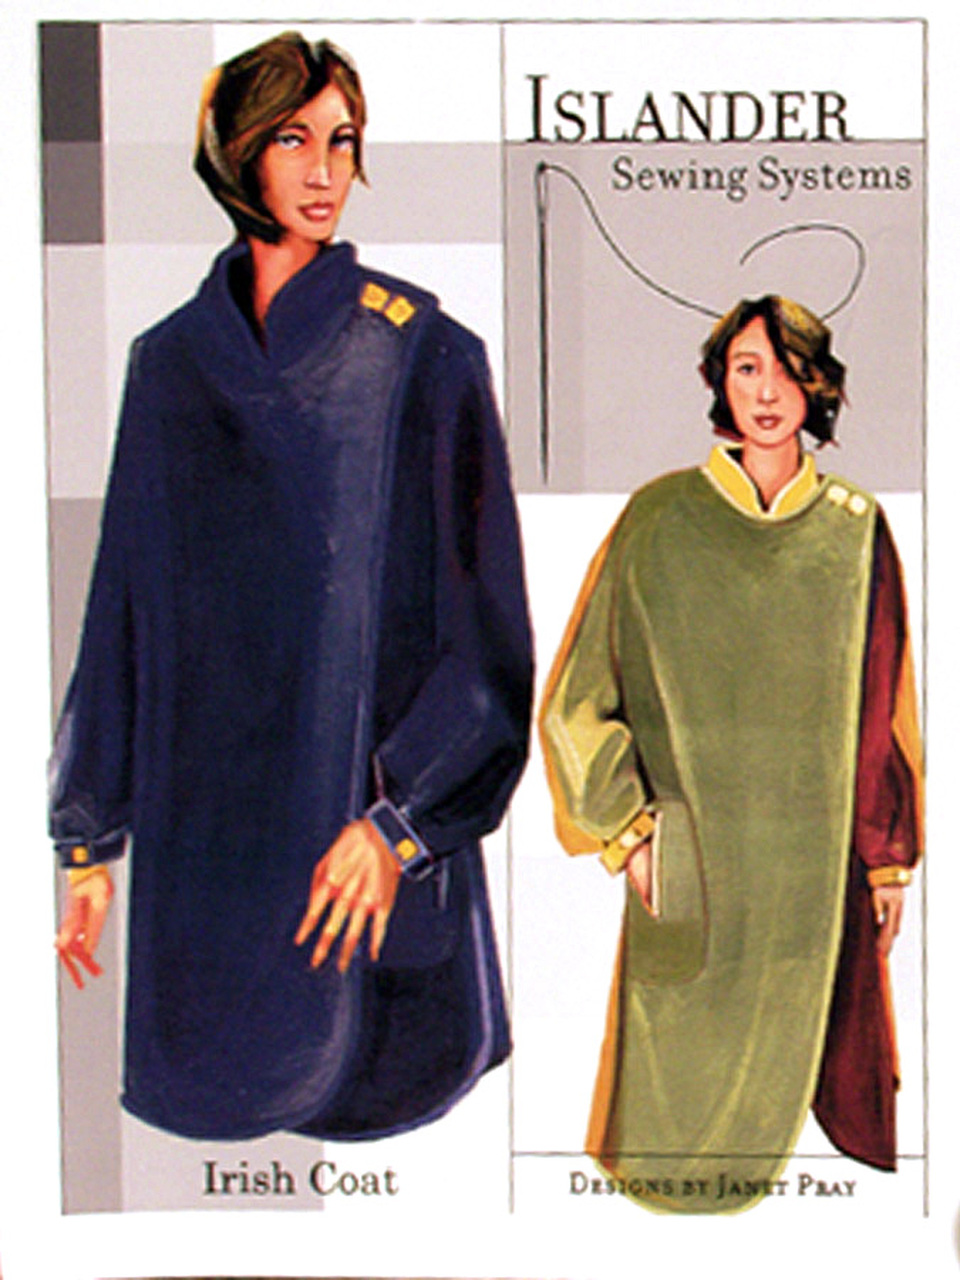 ow irish coat pattern islander sewing